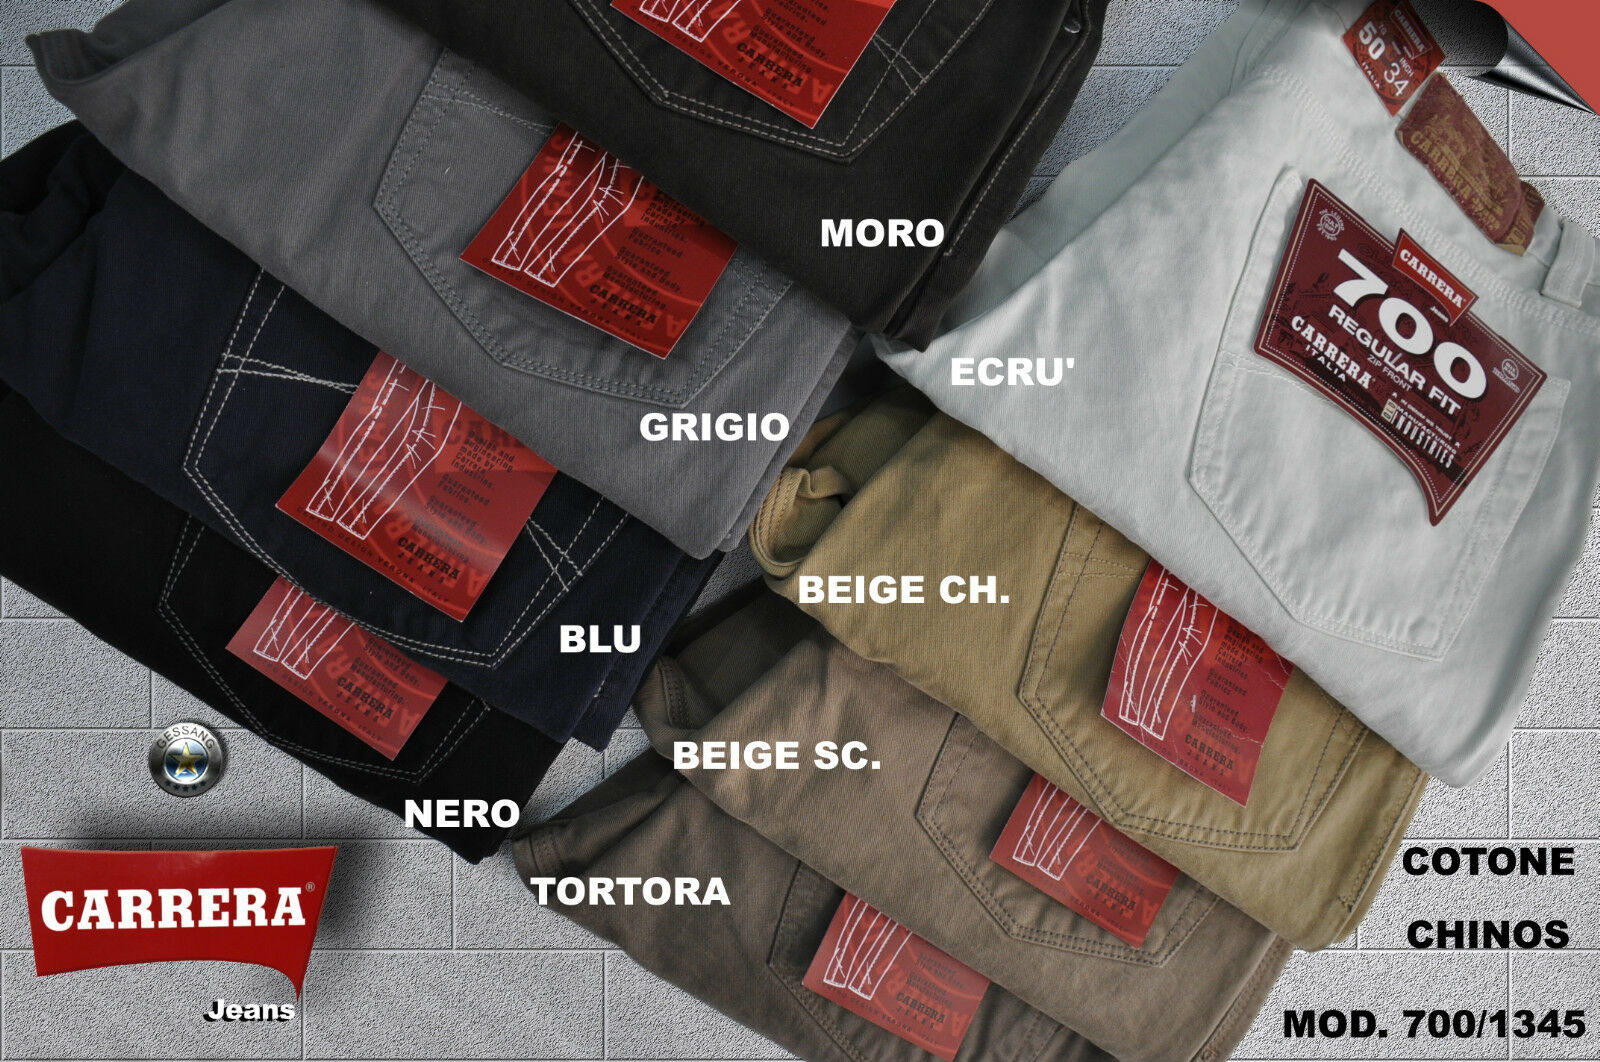 PANTALONE CARRERA 5 Jeans COTONE CHINOS 5 CARRERA COLOR 46 48 50 52 54 56 58 4d4598